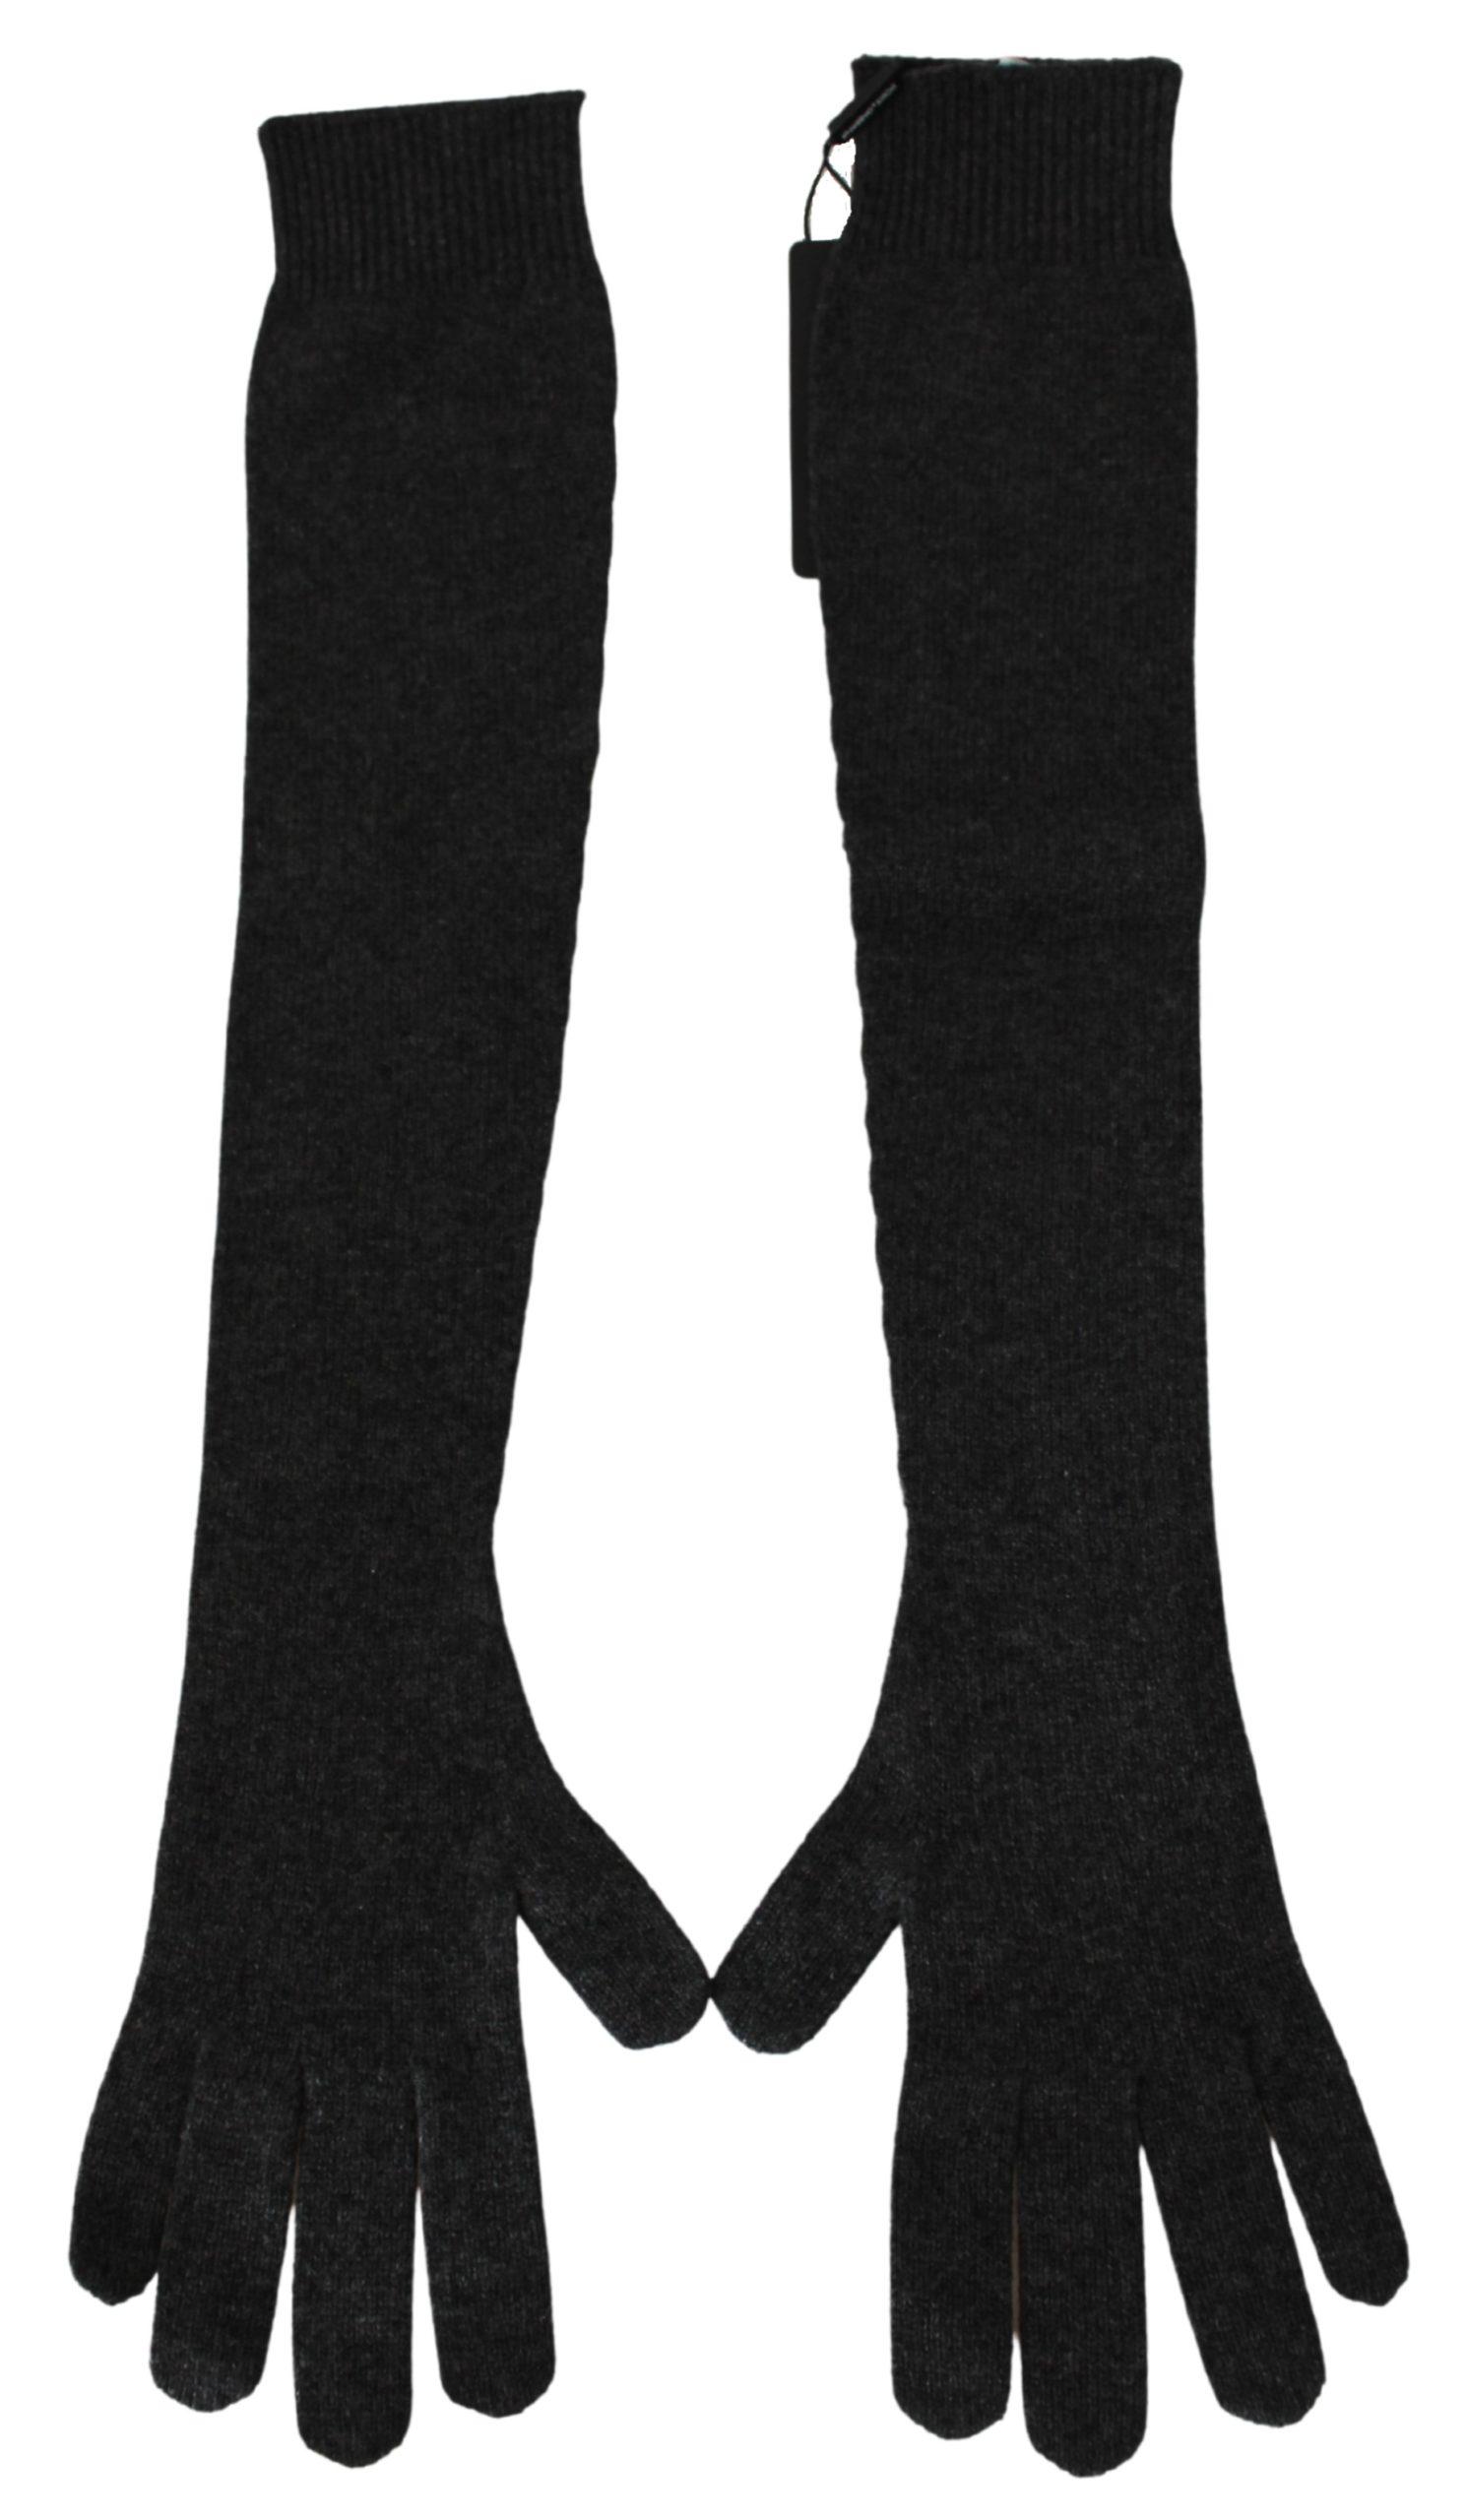 Dolce & Gabbana Women's Elbow Length Soft Warm Cashmere Gloves Gray LB1030 - 8.5|L